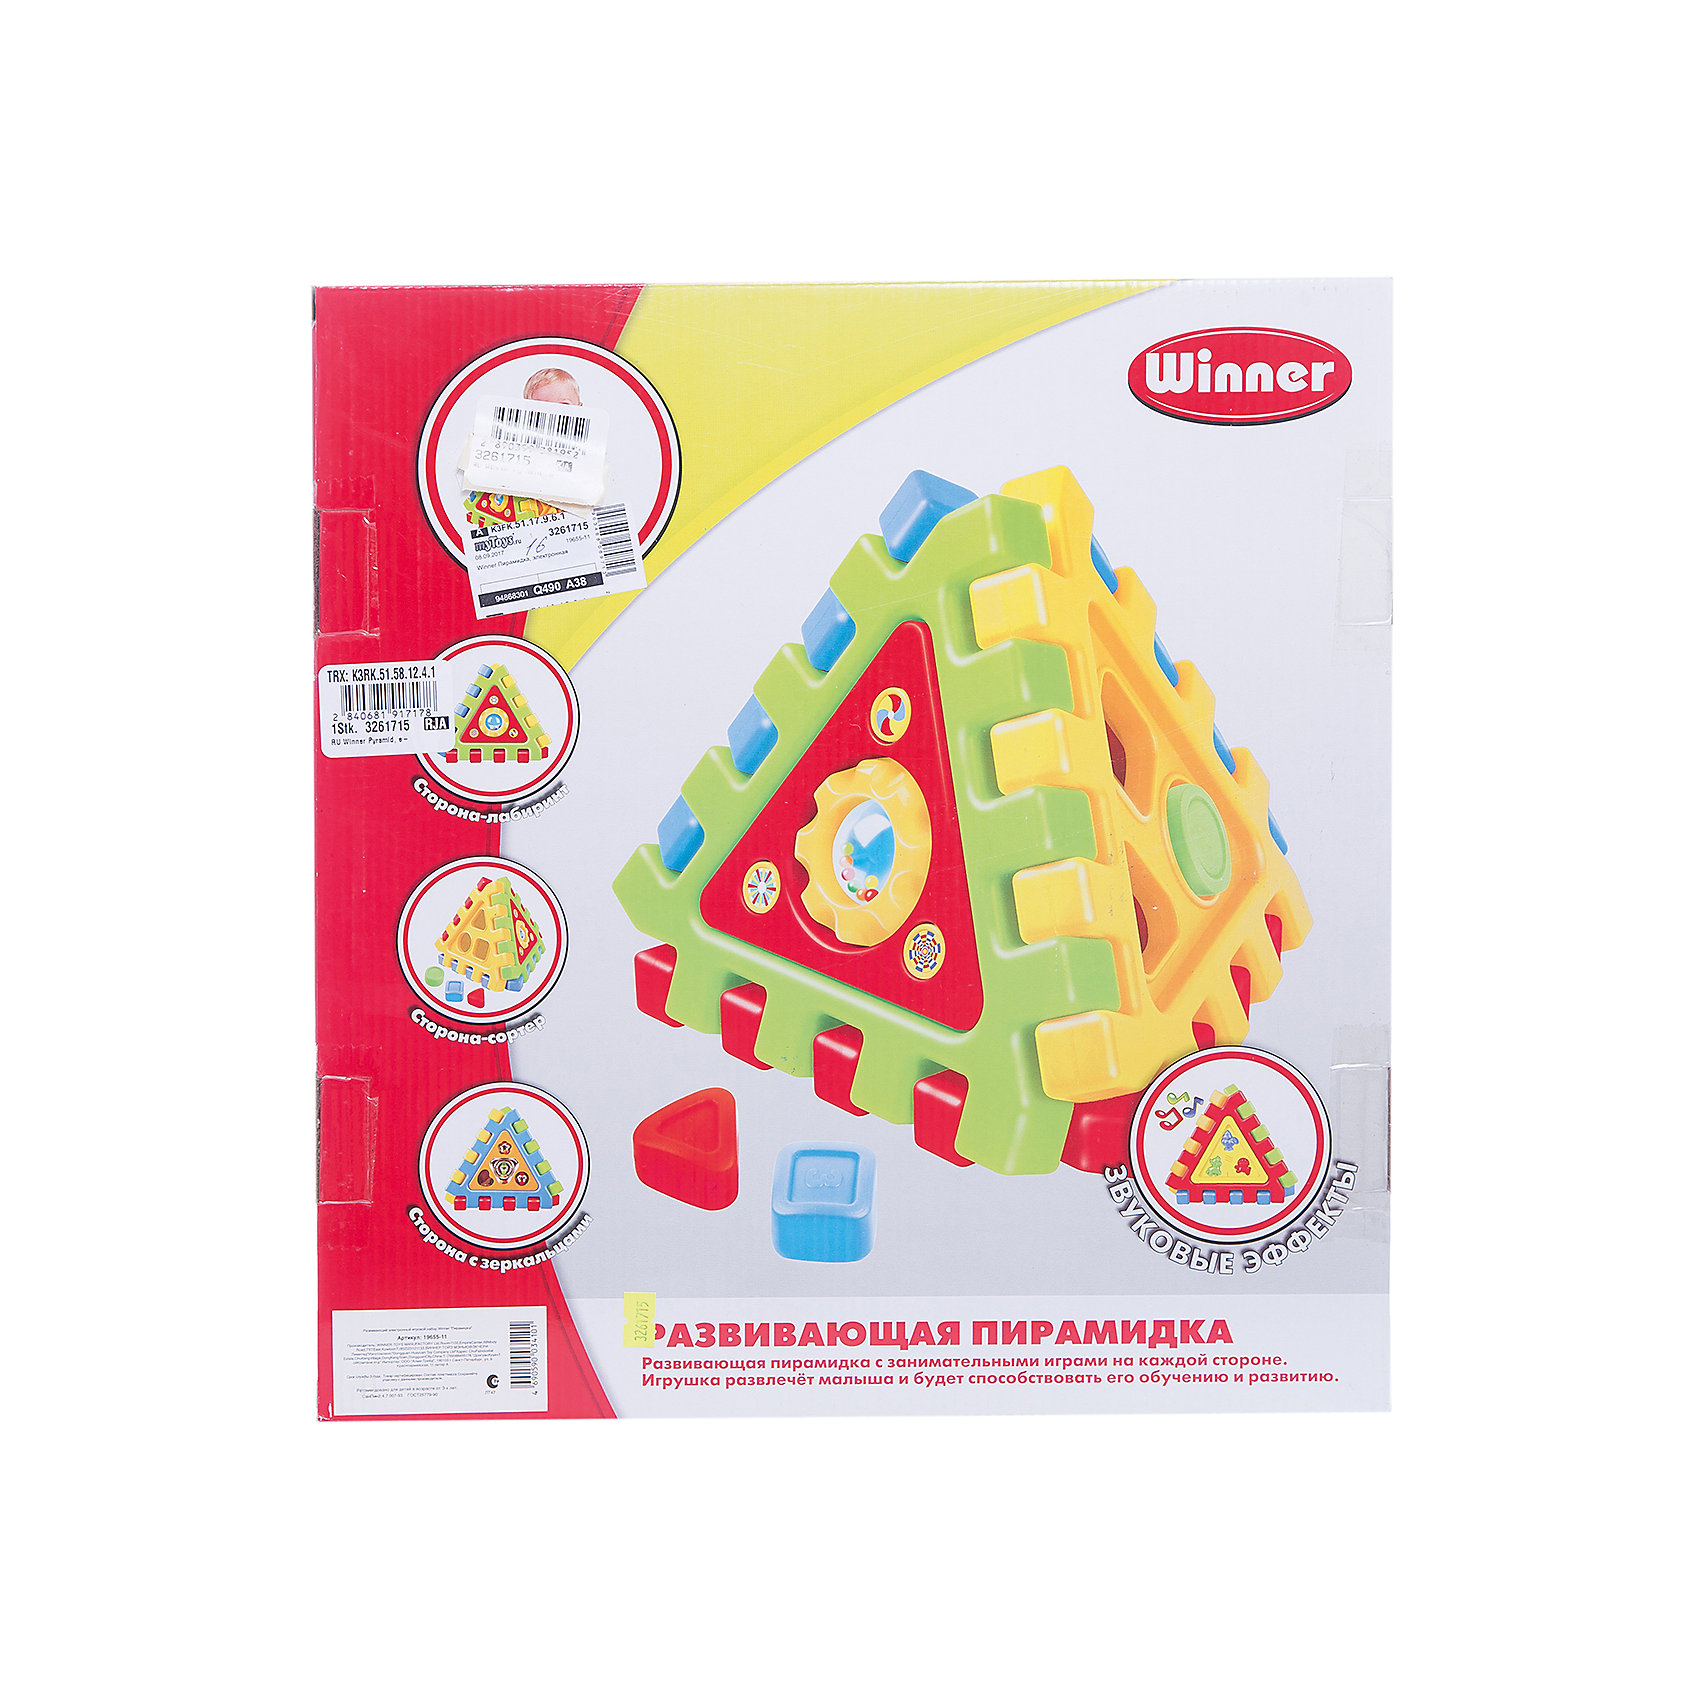 Winner Пирамидка, электронная от myToys